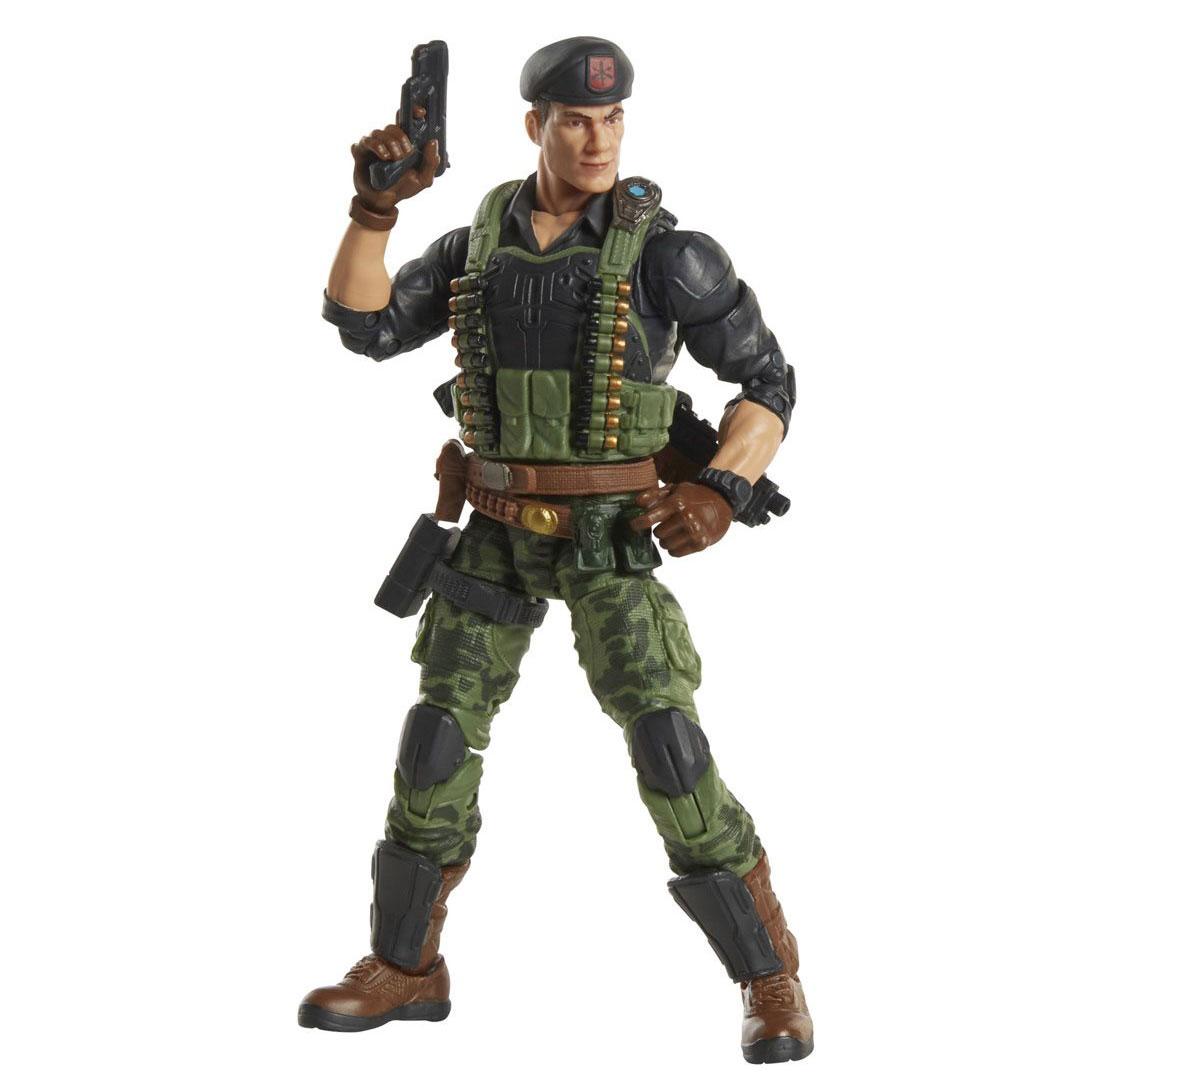 gi-joe-classified-series-flint-action-figure-3